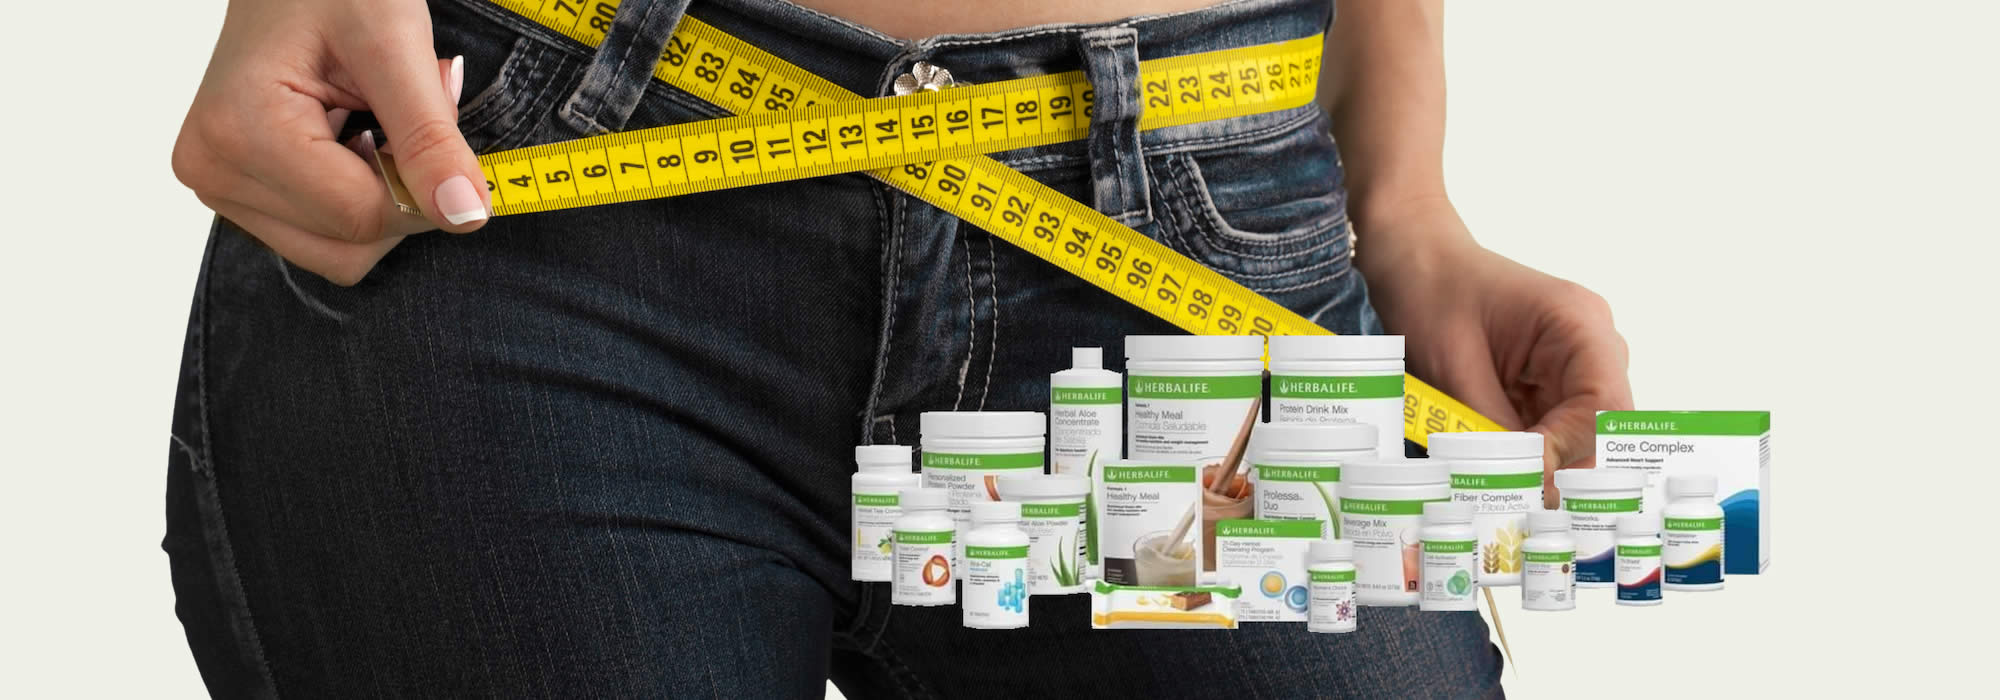 Vercors sports team - Perdre du poids avec Herbalife_herbalife nutrition